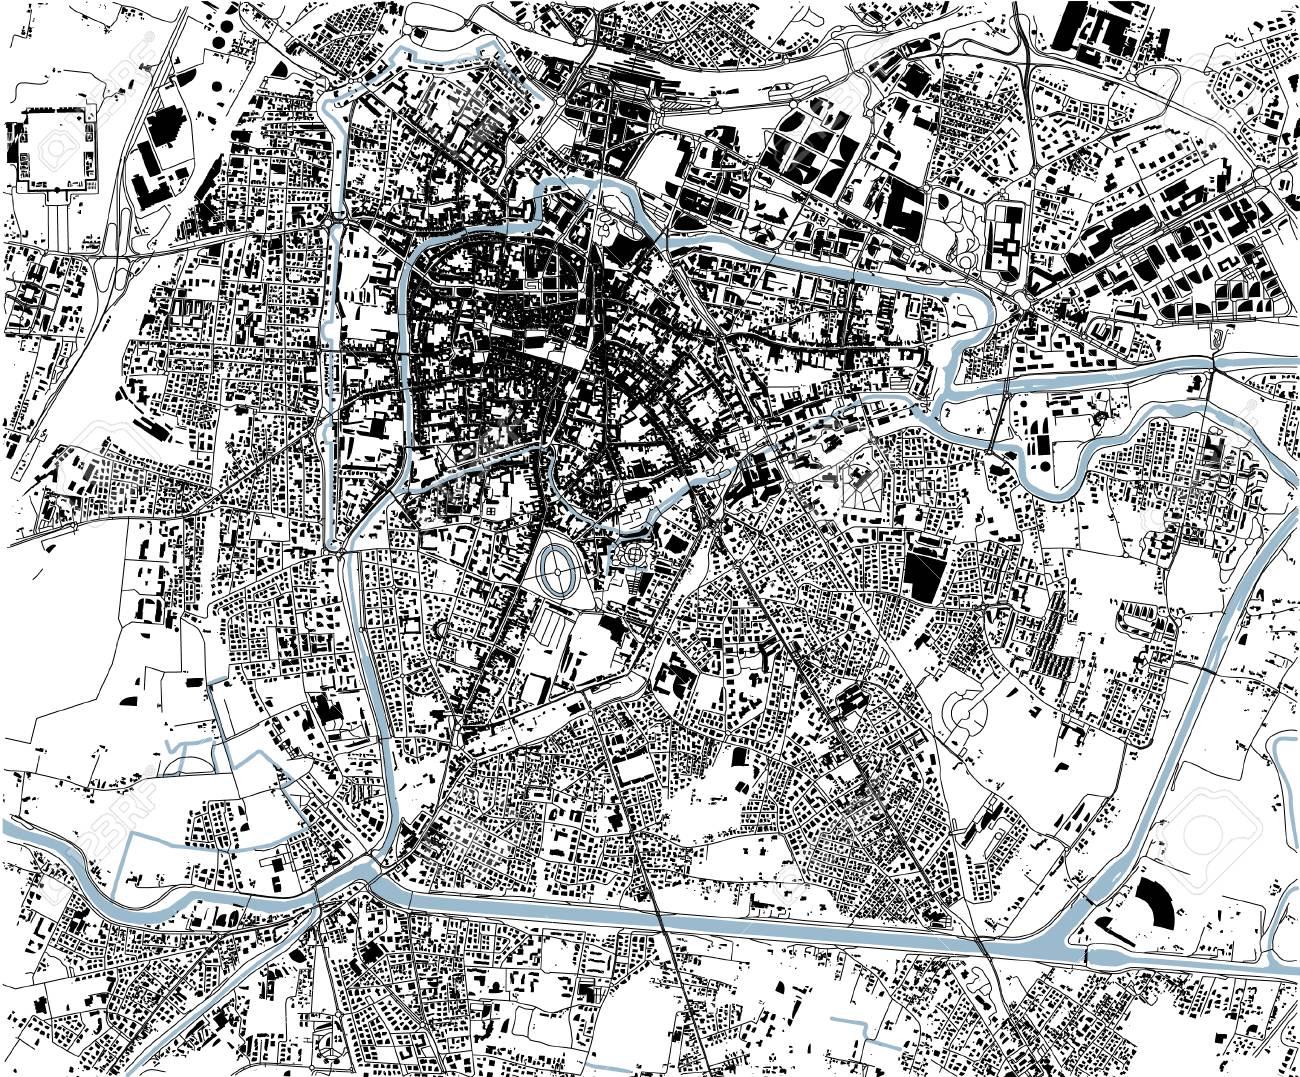 Satellite Map Of Padua Padua Italy City Streets Street Map